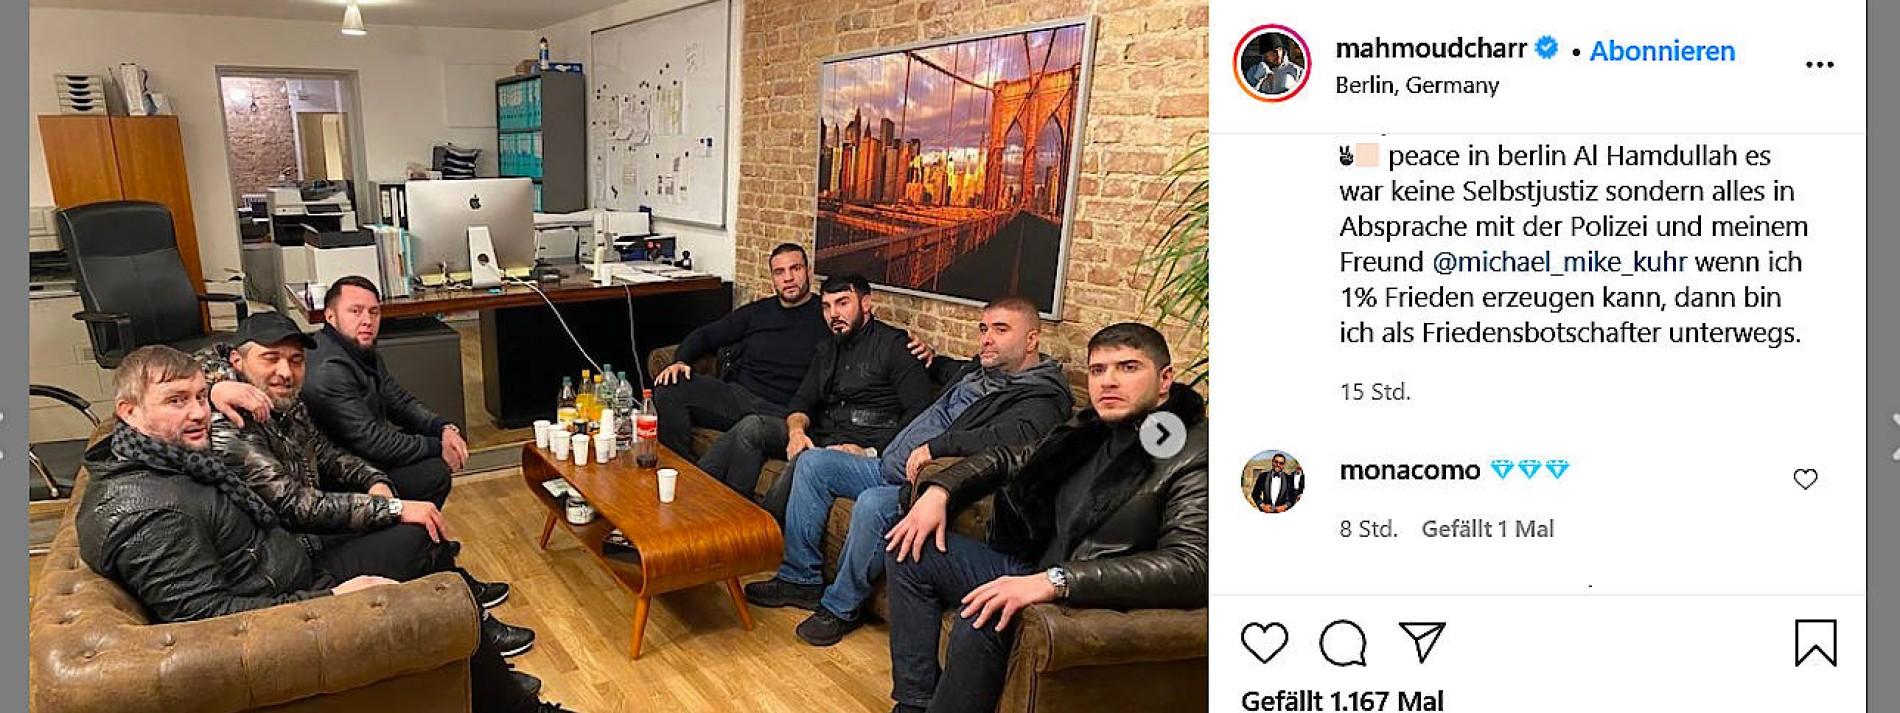 Profiboxer stiftet Frieden kurz vor Bandenkrieg